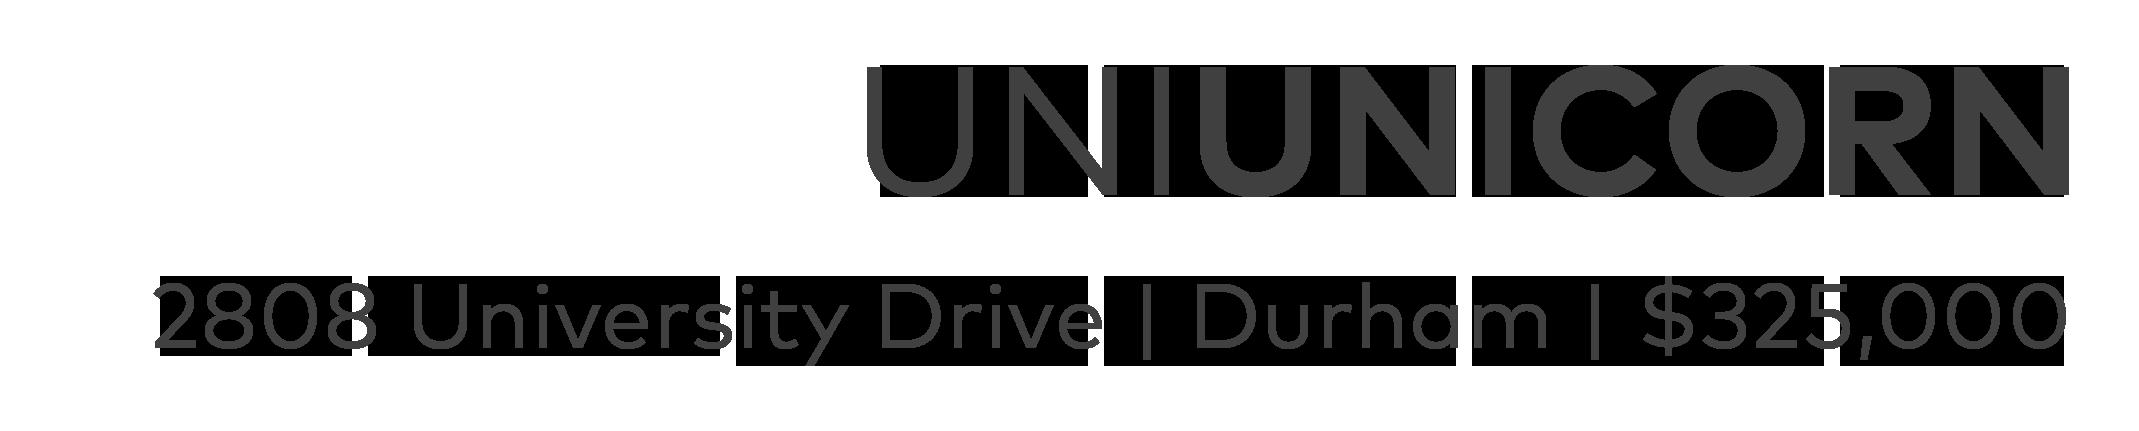 Uni Unicorn, Durham NC | Listing Agent: Susan Ungerleider of RED Collective